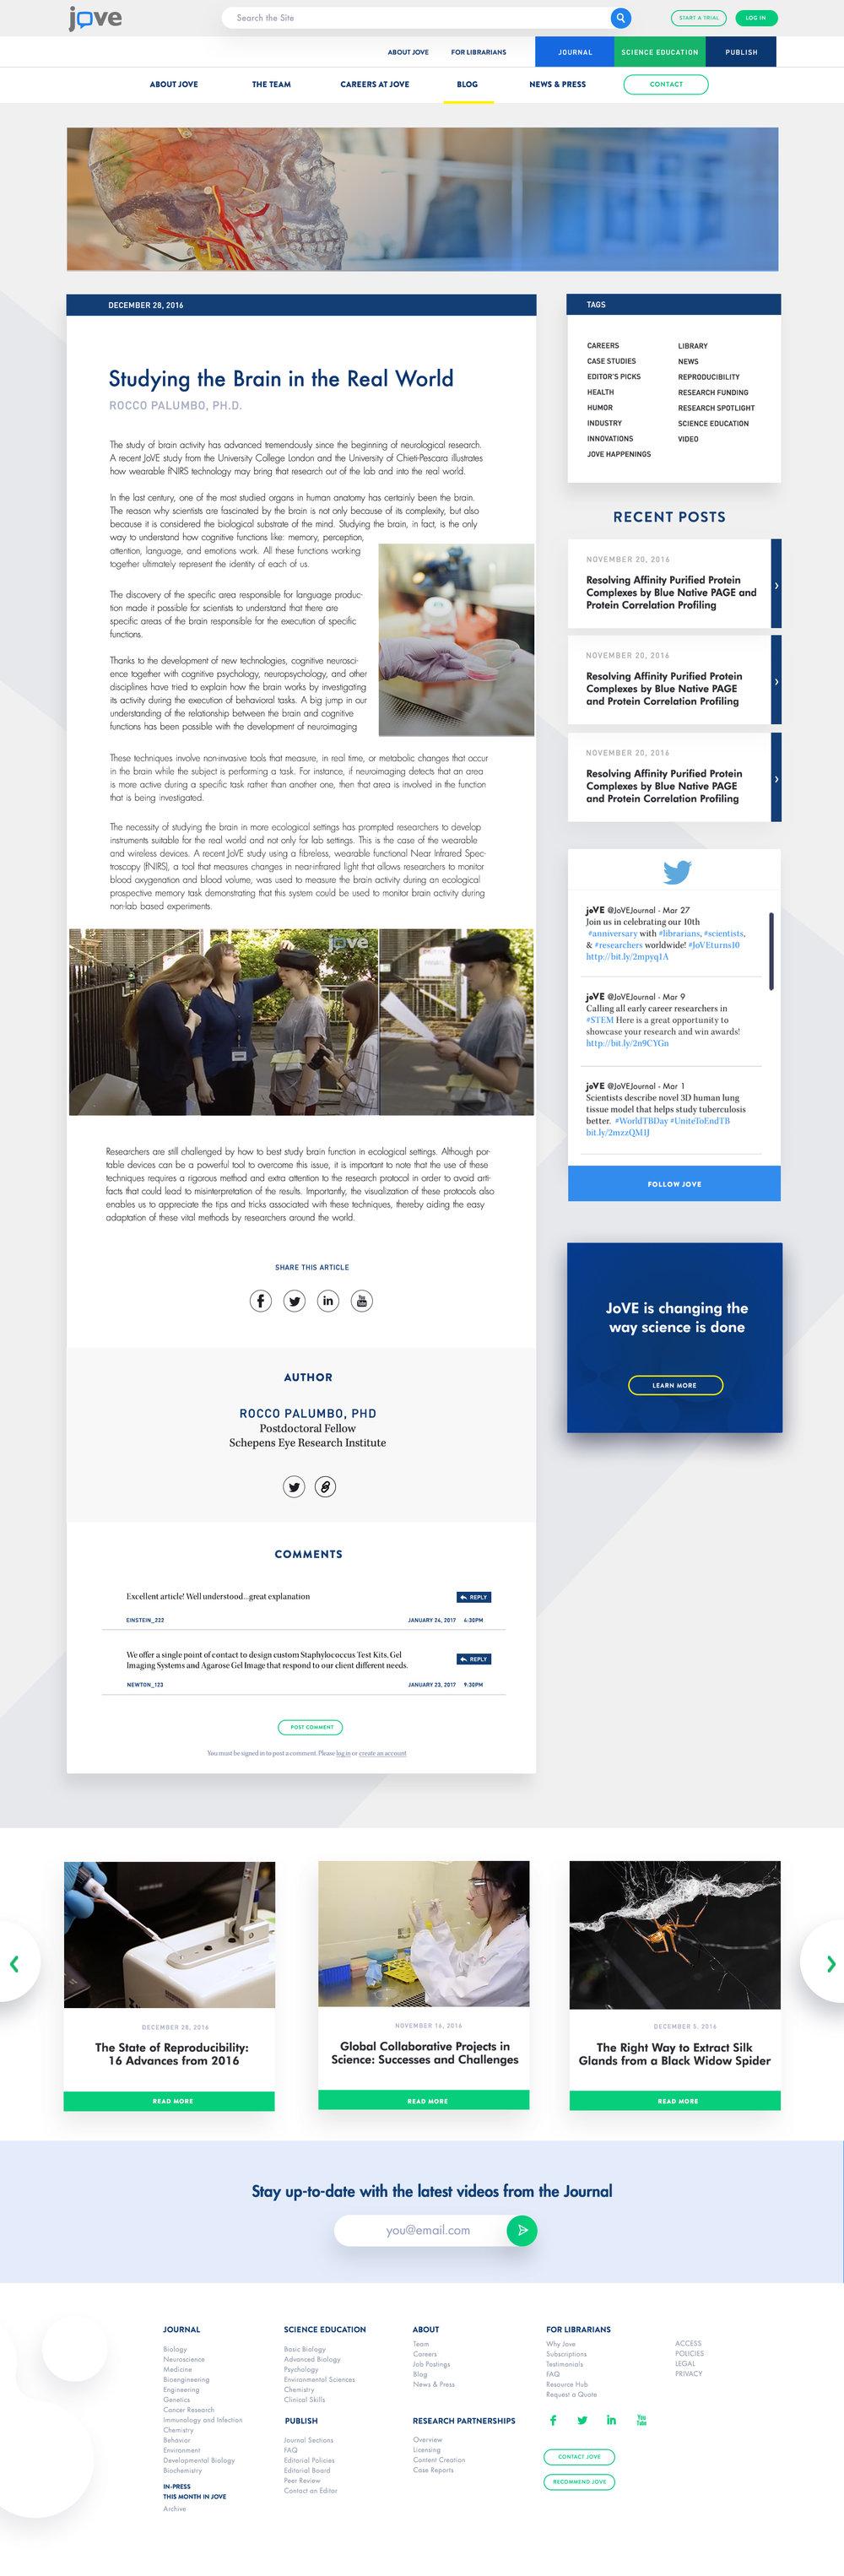 JVE_Blog_Post.jpg